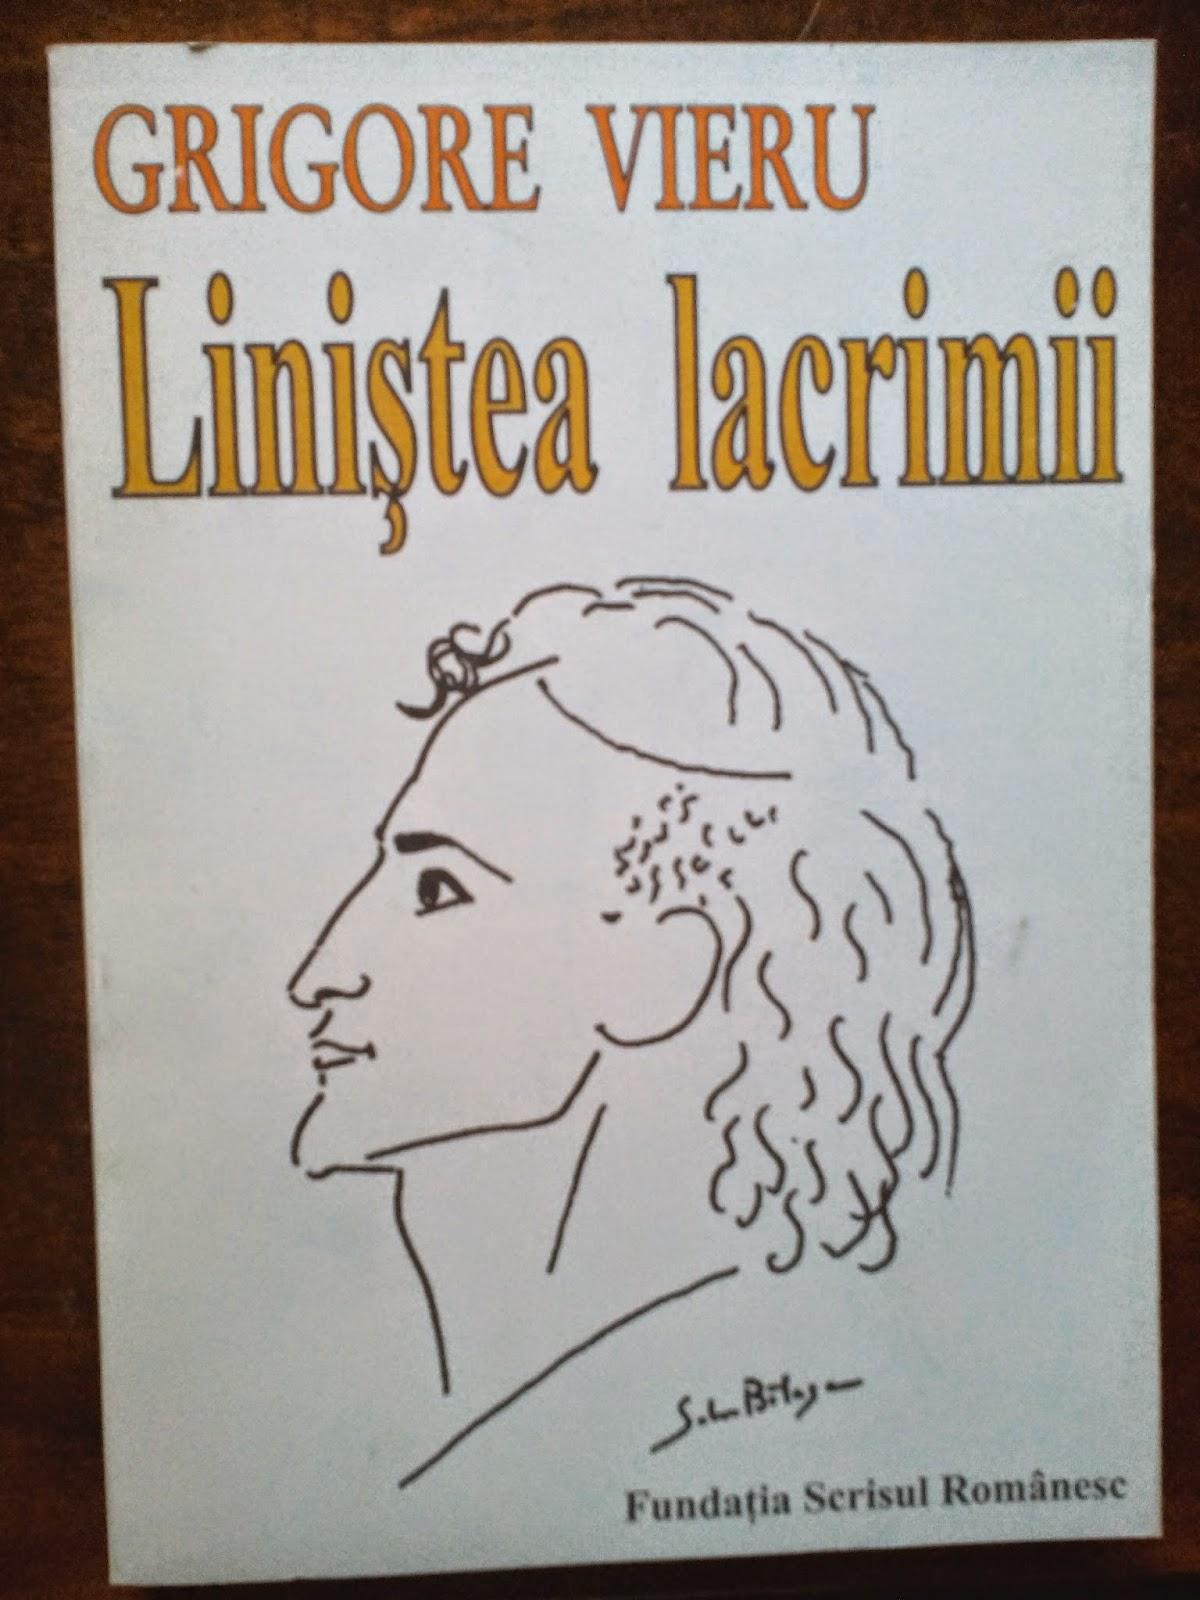 Fundatia Scrisul Romanesc - Grigore Vieru - Linistea lacrimii